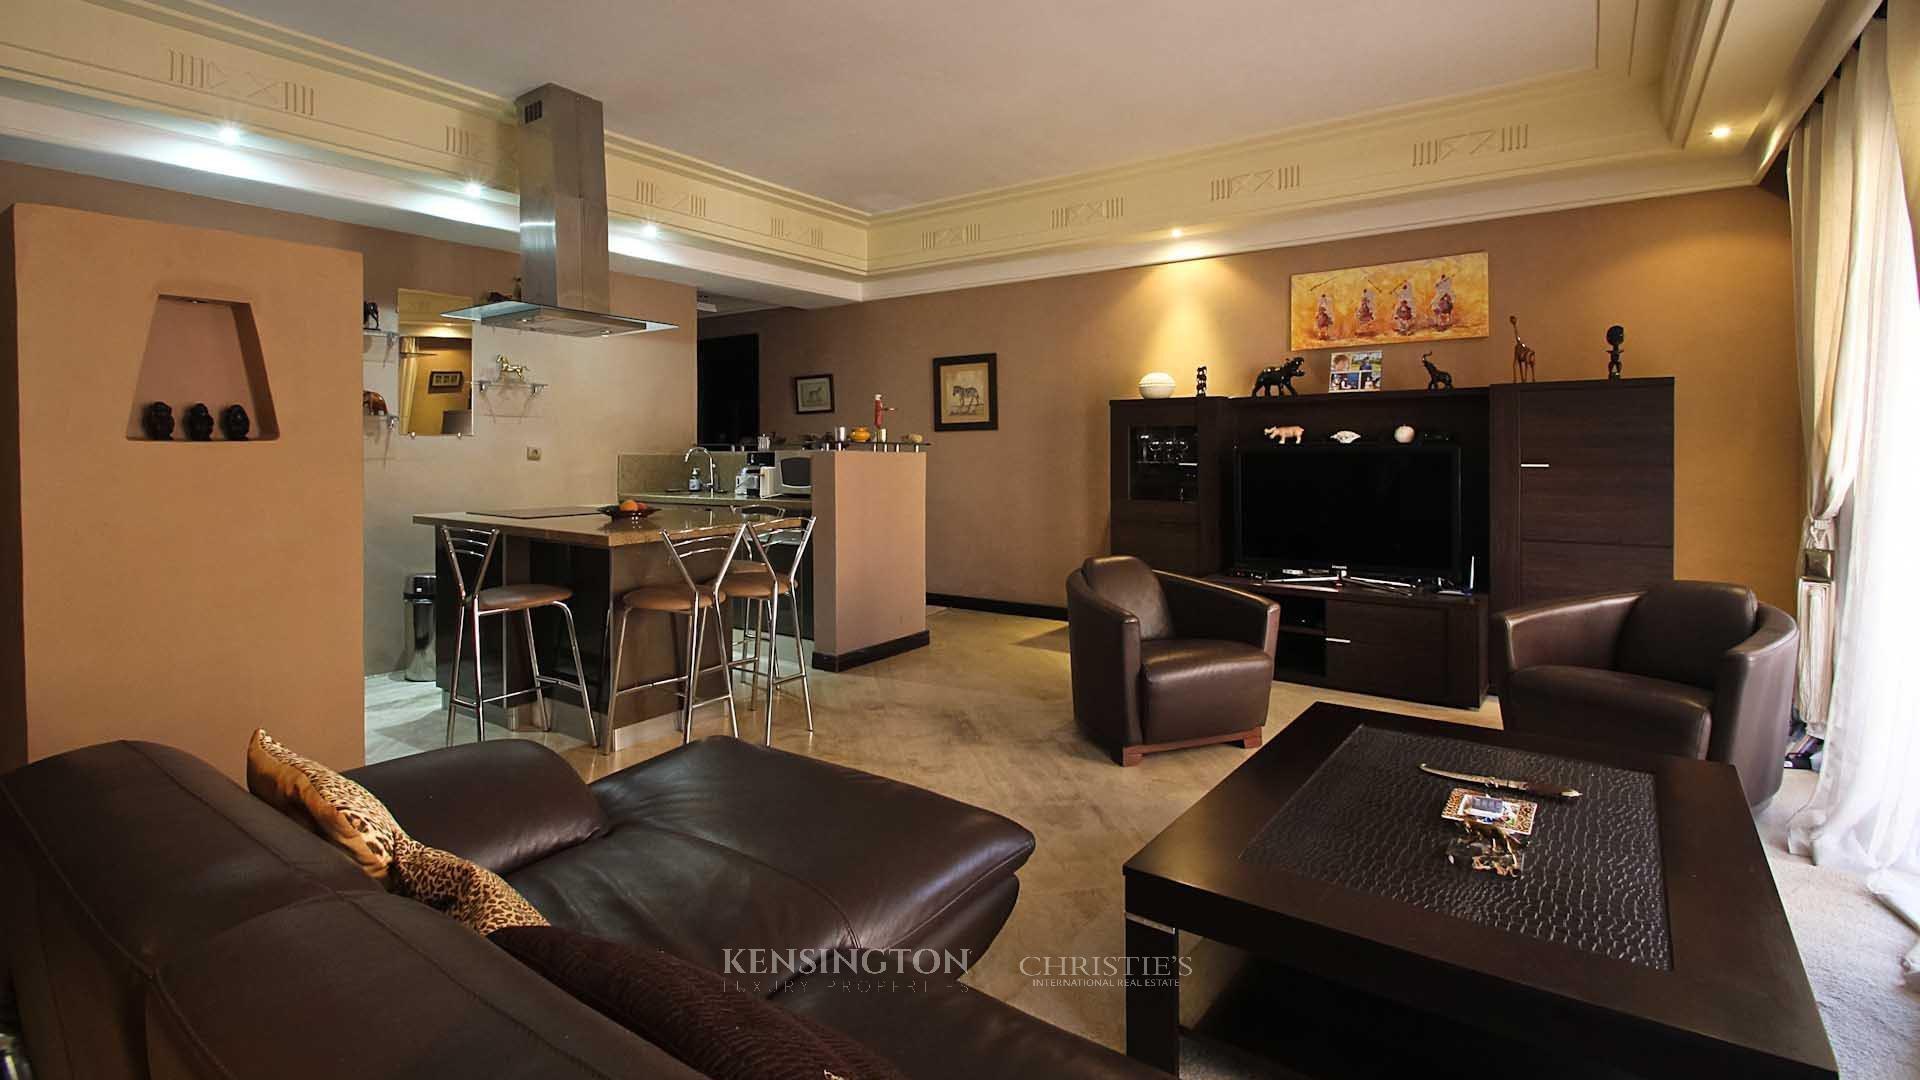 KPPM01089: Duplex Ocre Apartment Marrakech Morocco